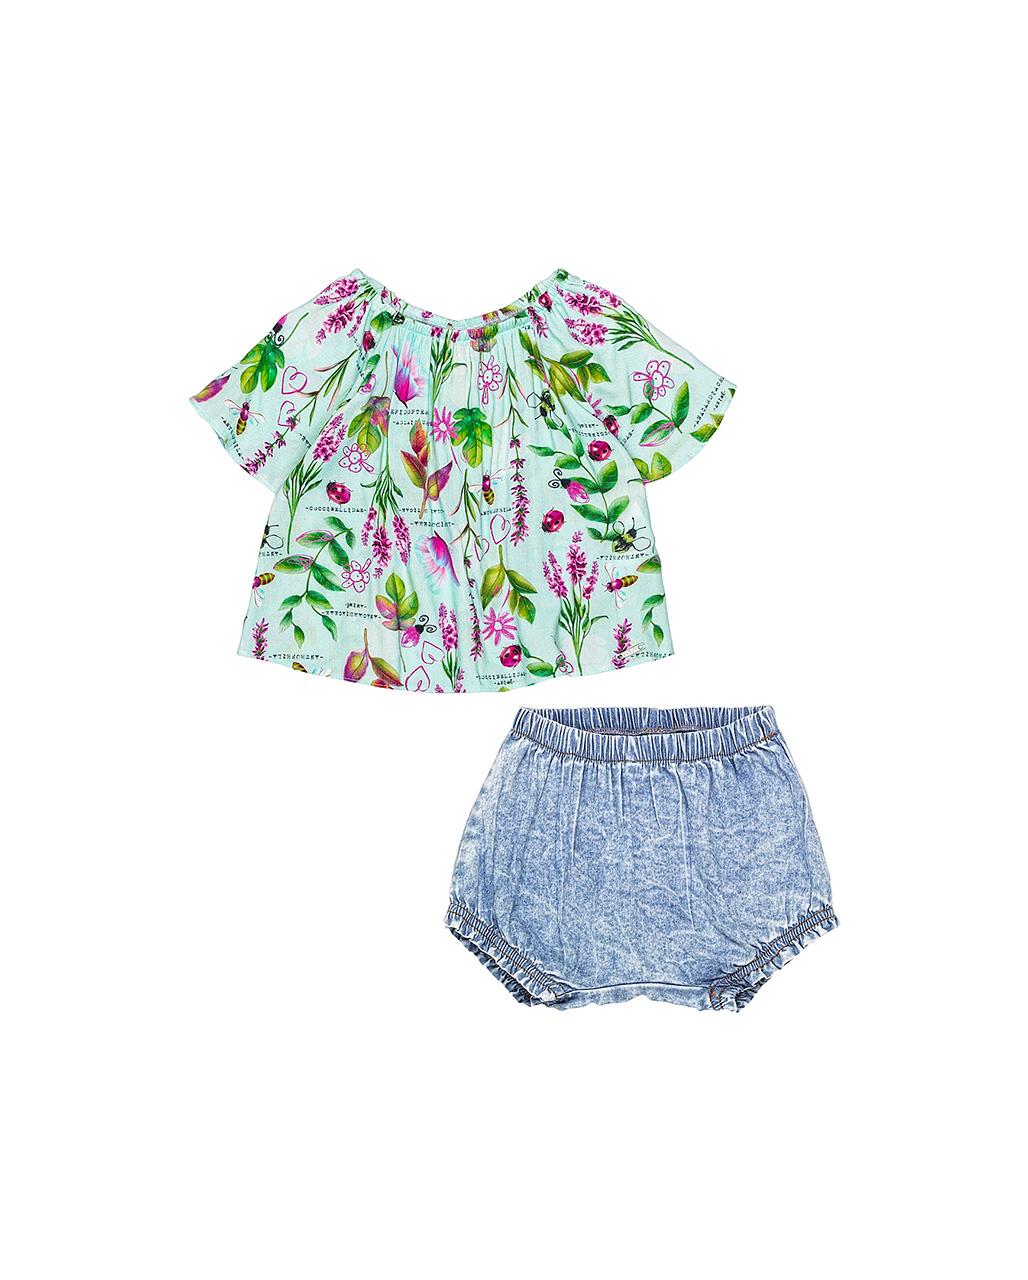 Conjunto Bebê Bata Floral e Shorts Jeans Animê